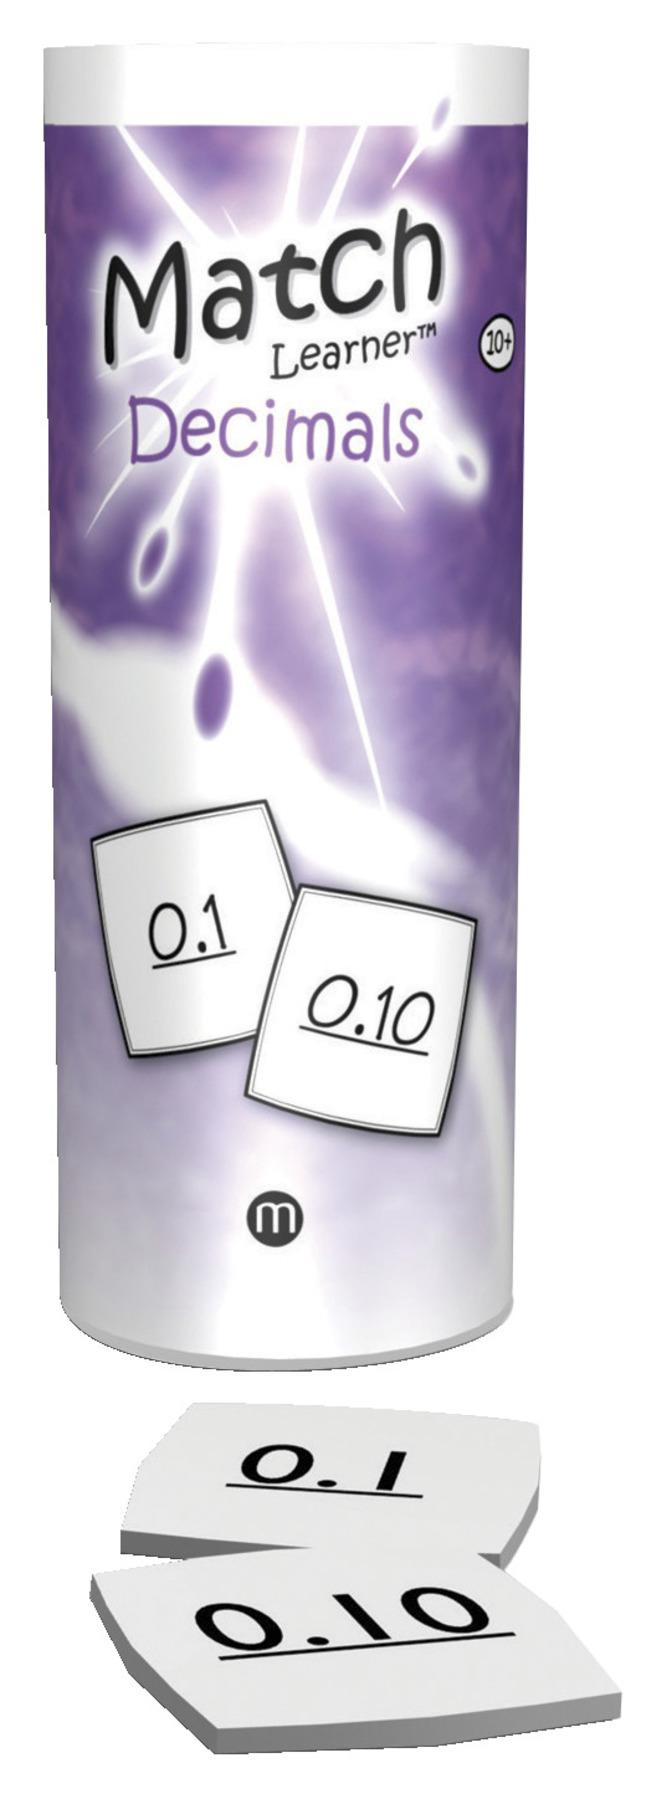 Rational Numbers Games, Activities, Decimal Games, Decimal Worksheets Supplies, Item Number 1321242